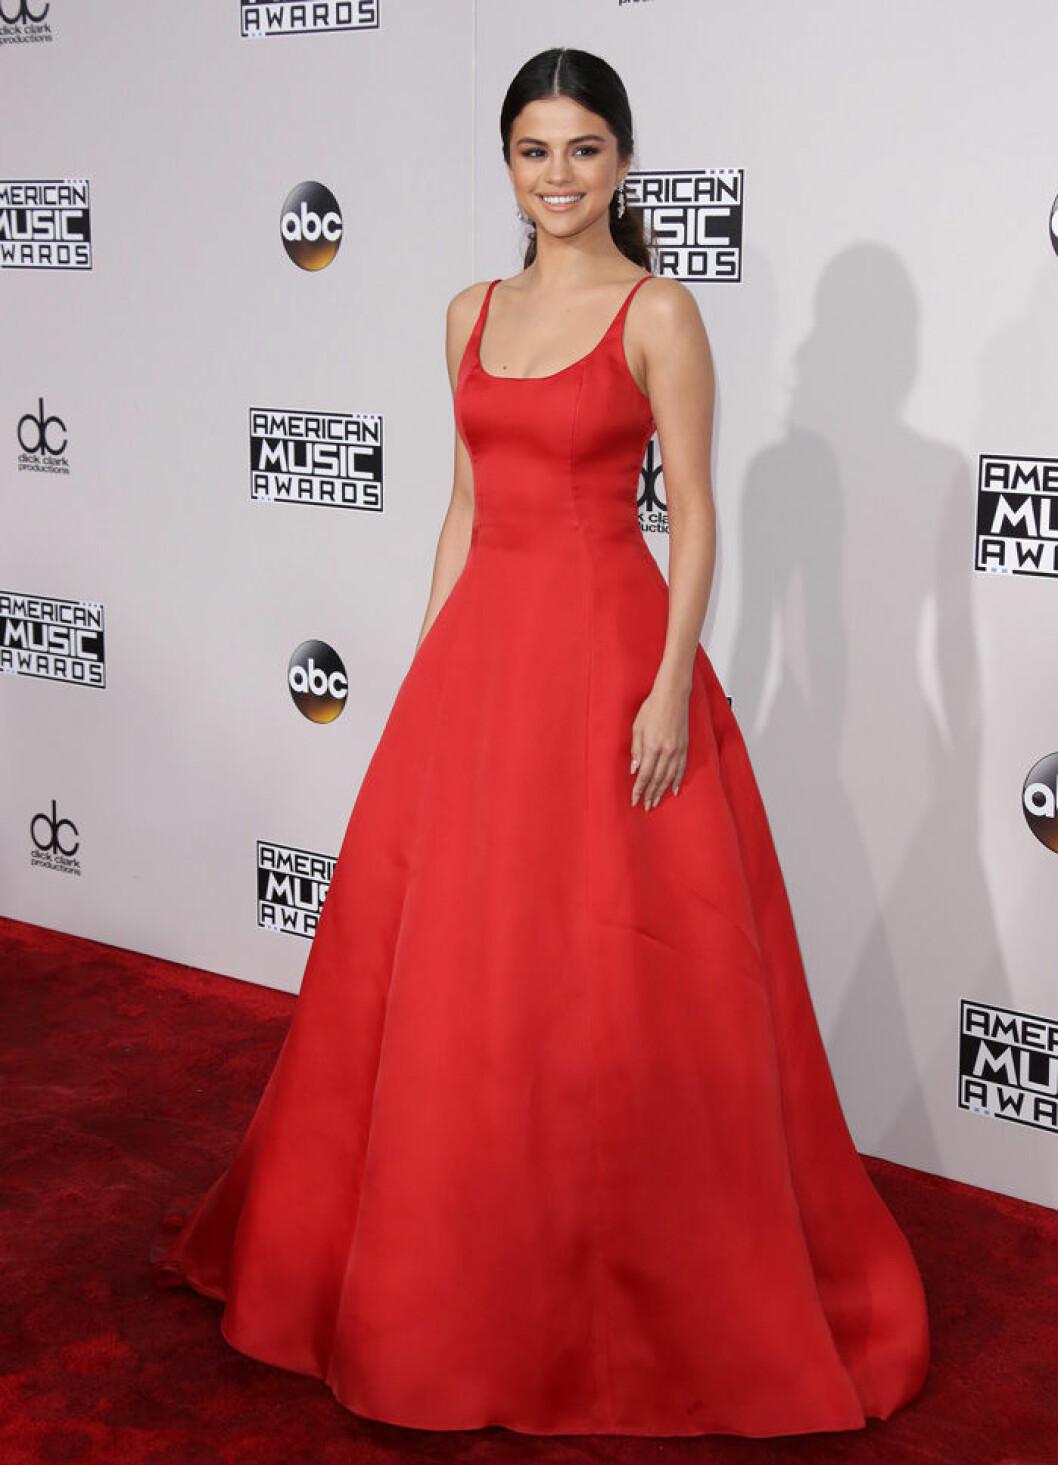 En bild på sångerskan Selena Gomez på American Music Awards 2016.